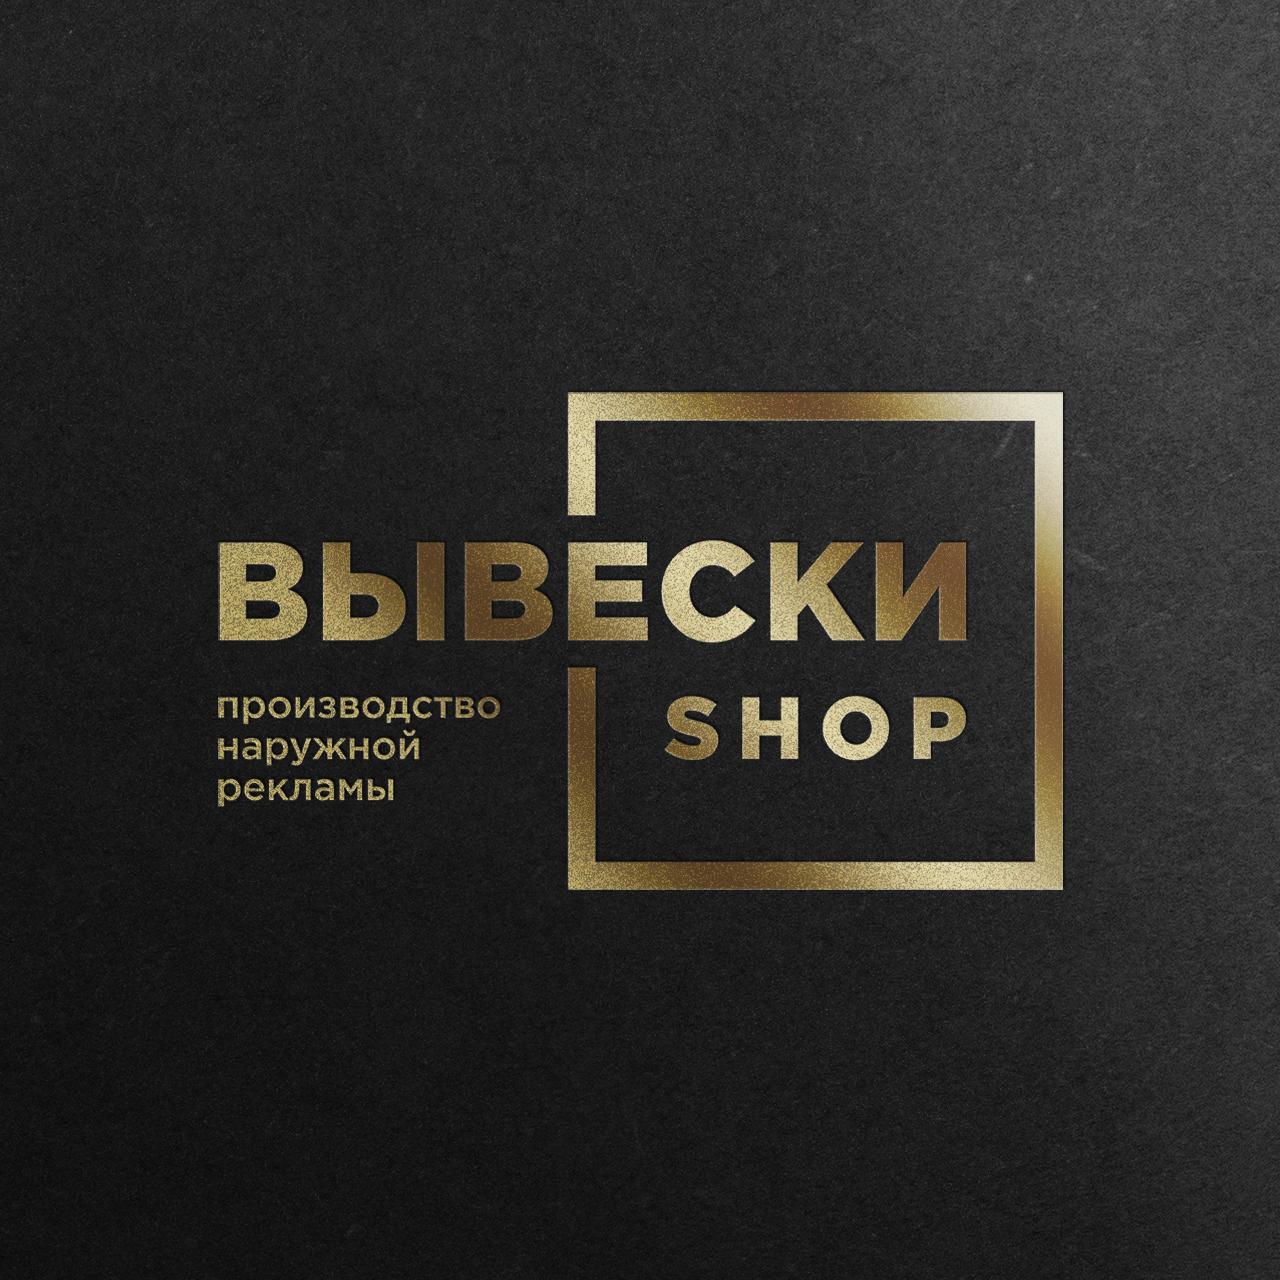 vyveski shop-logo-mockup-gold